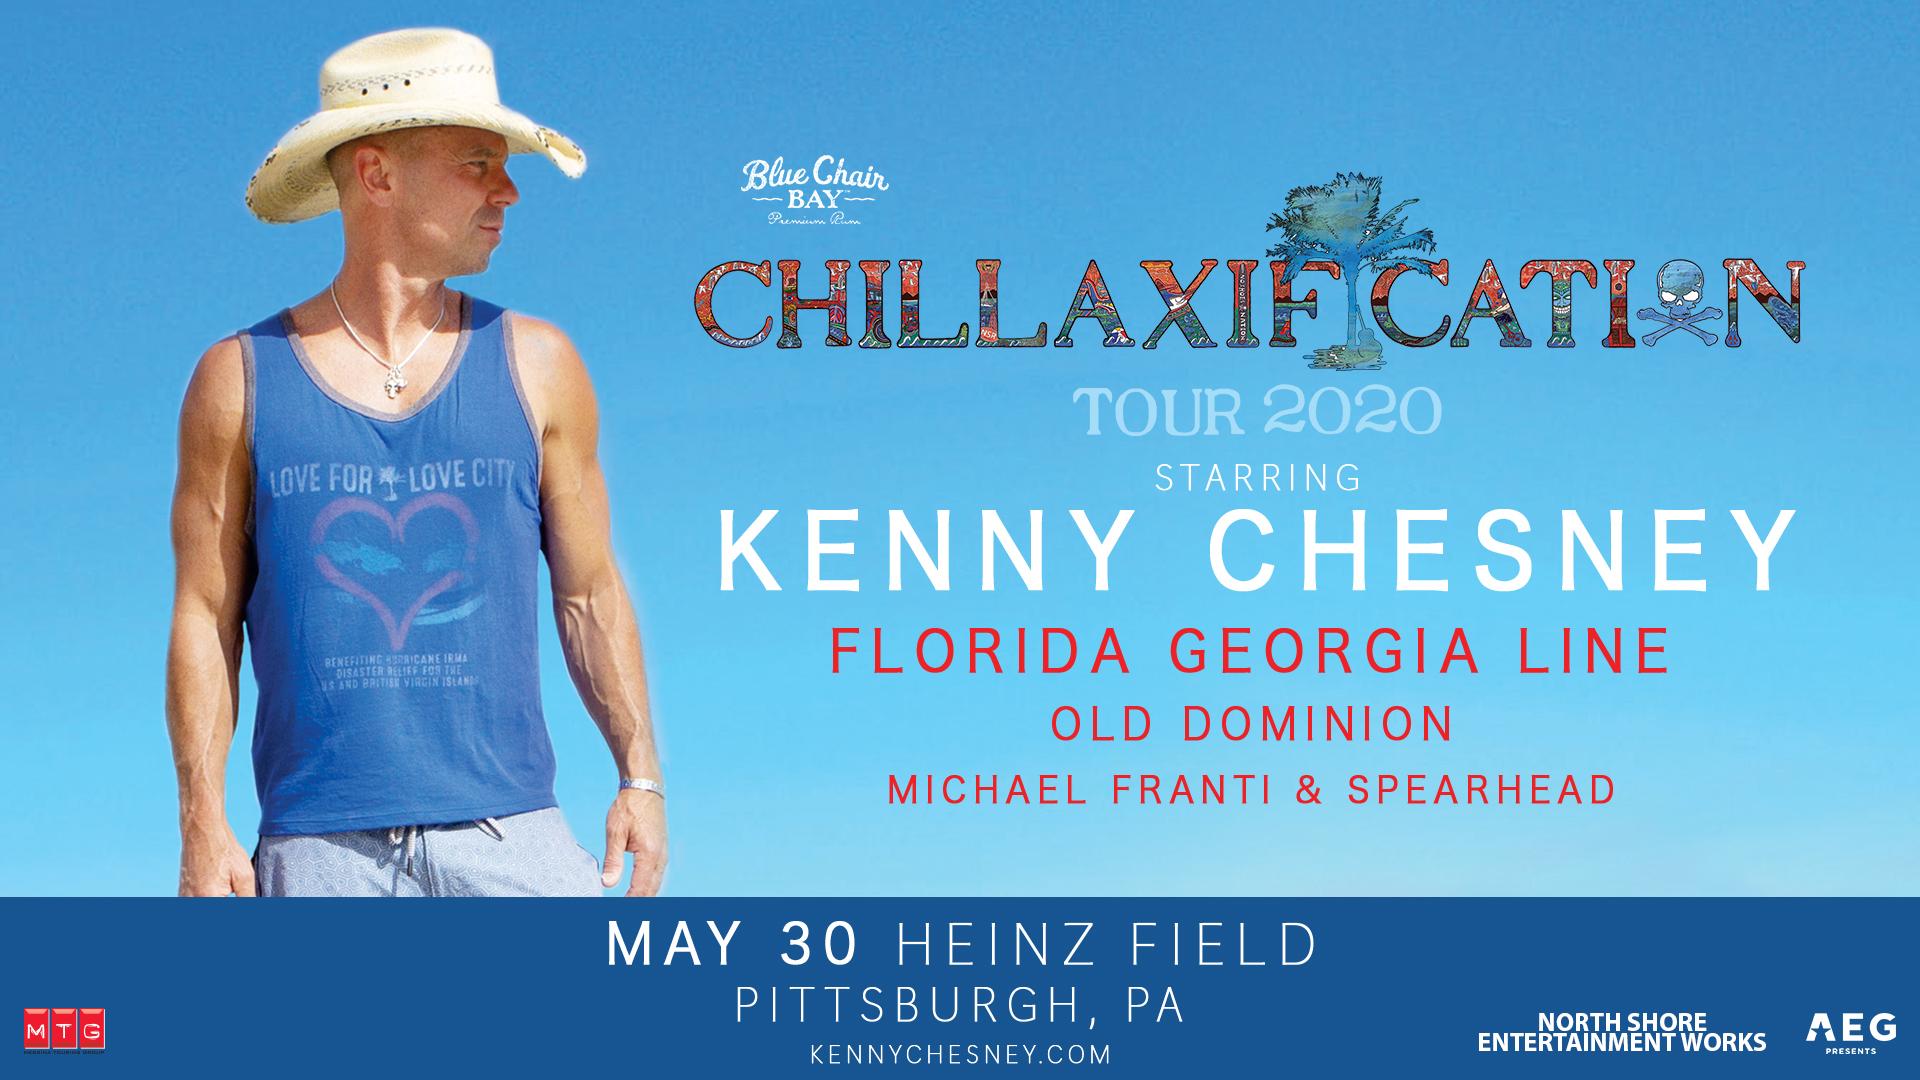 Kenny Chesney Pittsburgh Chillaxificiation featuring Florida Georgia Line, Old Dominion, Michael Franti & Spearhead